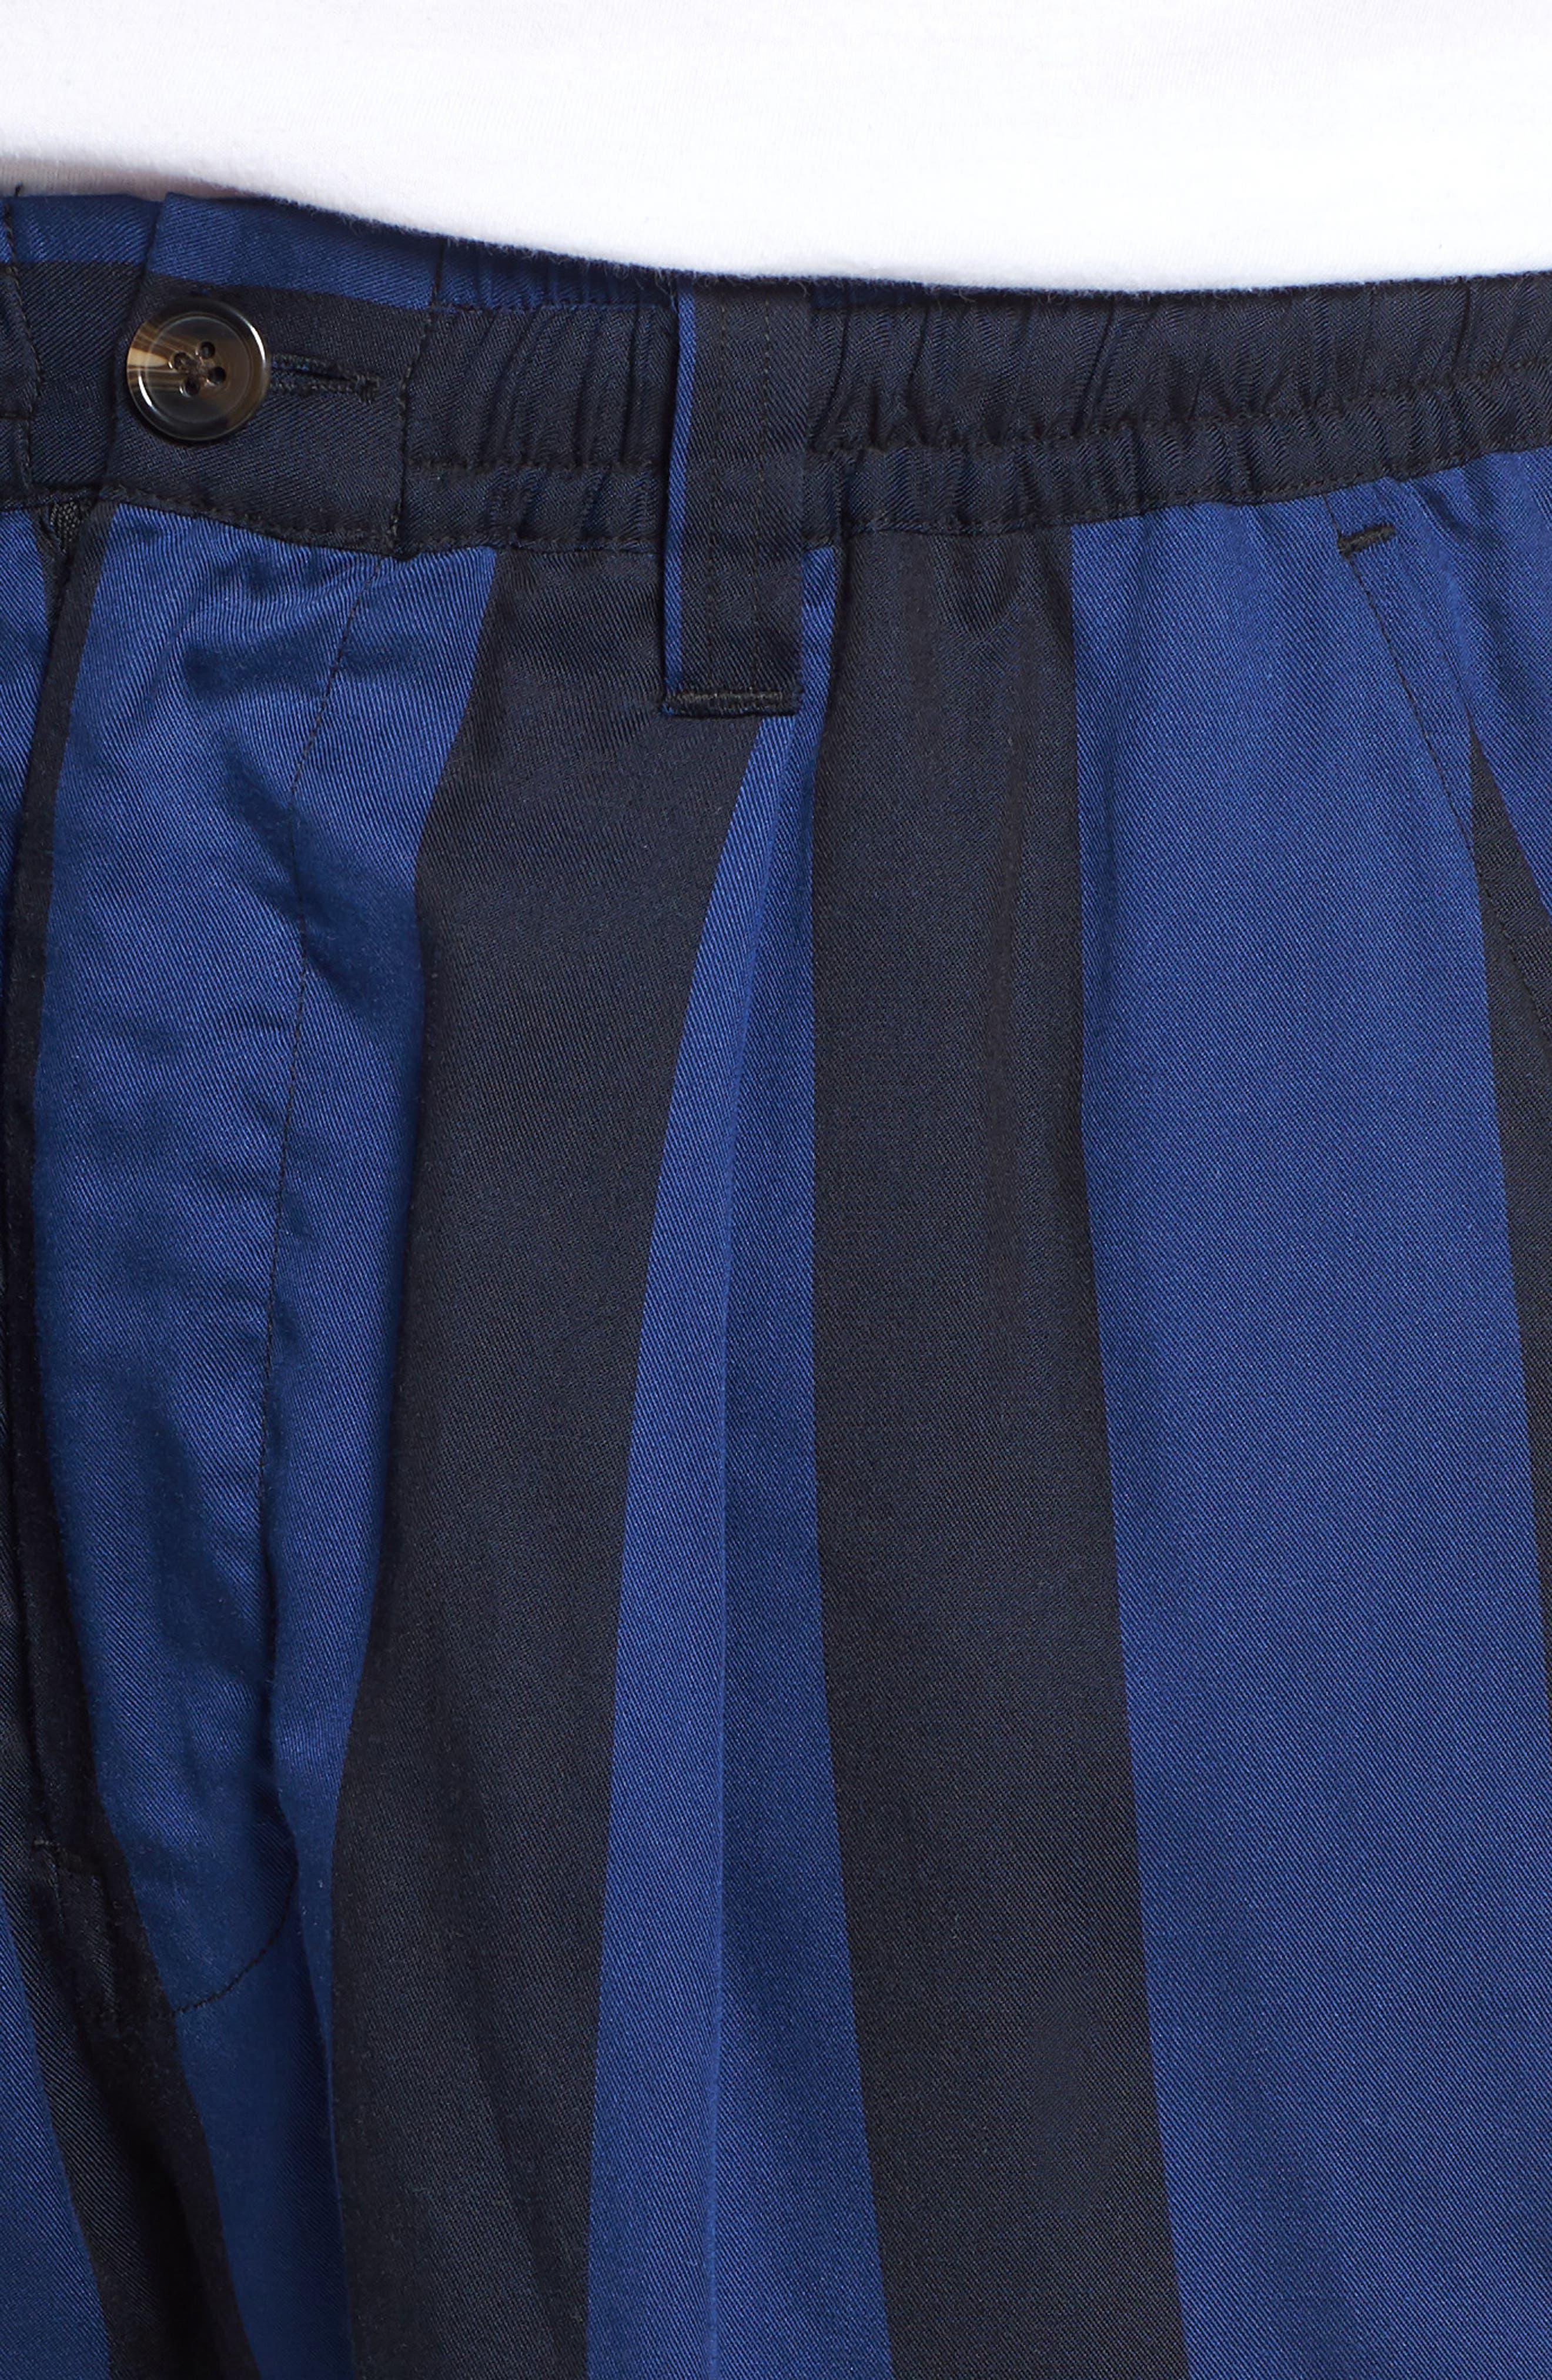 Keigo Broad Stripe Shorts,                             Alternate thumbnail 4, color,                             COBALT